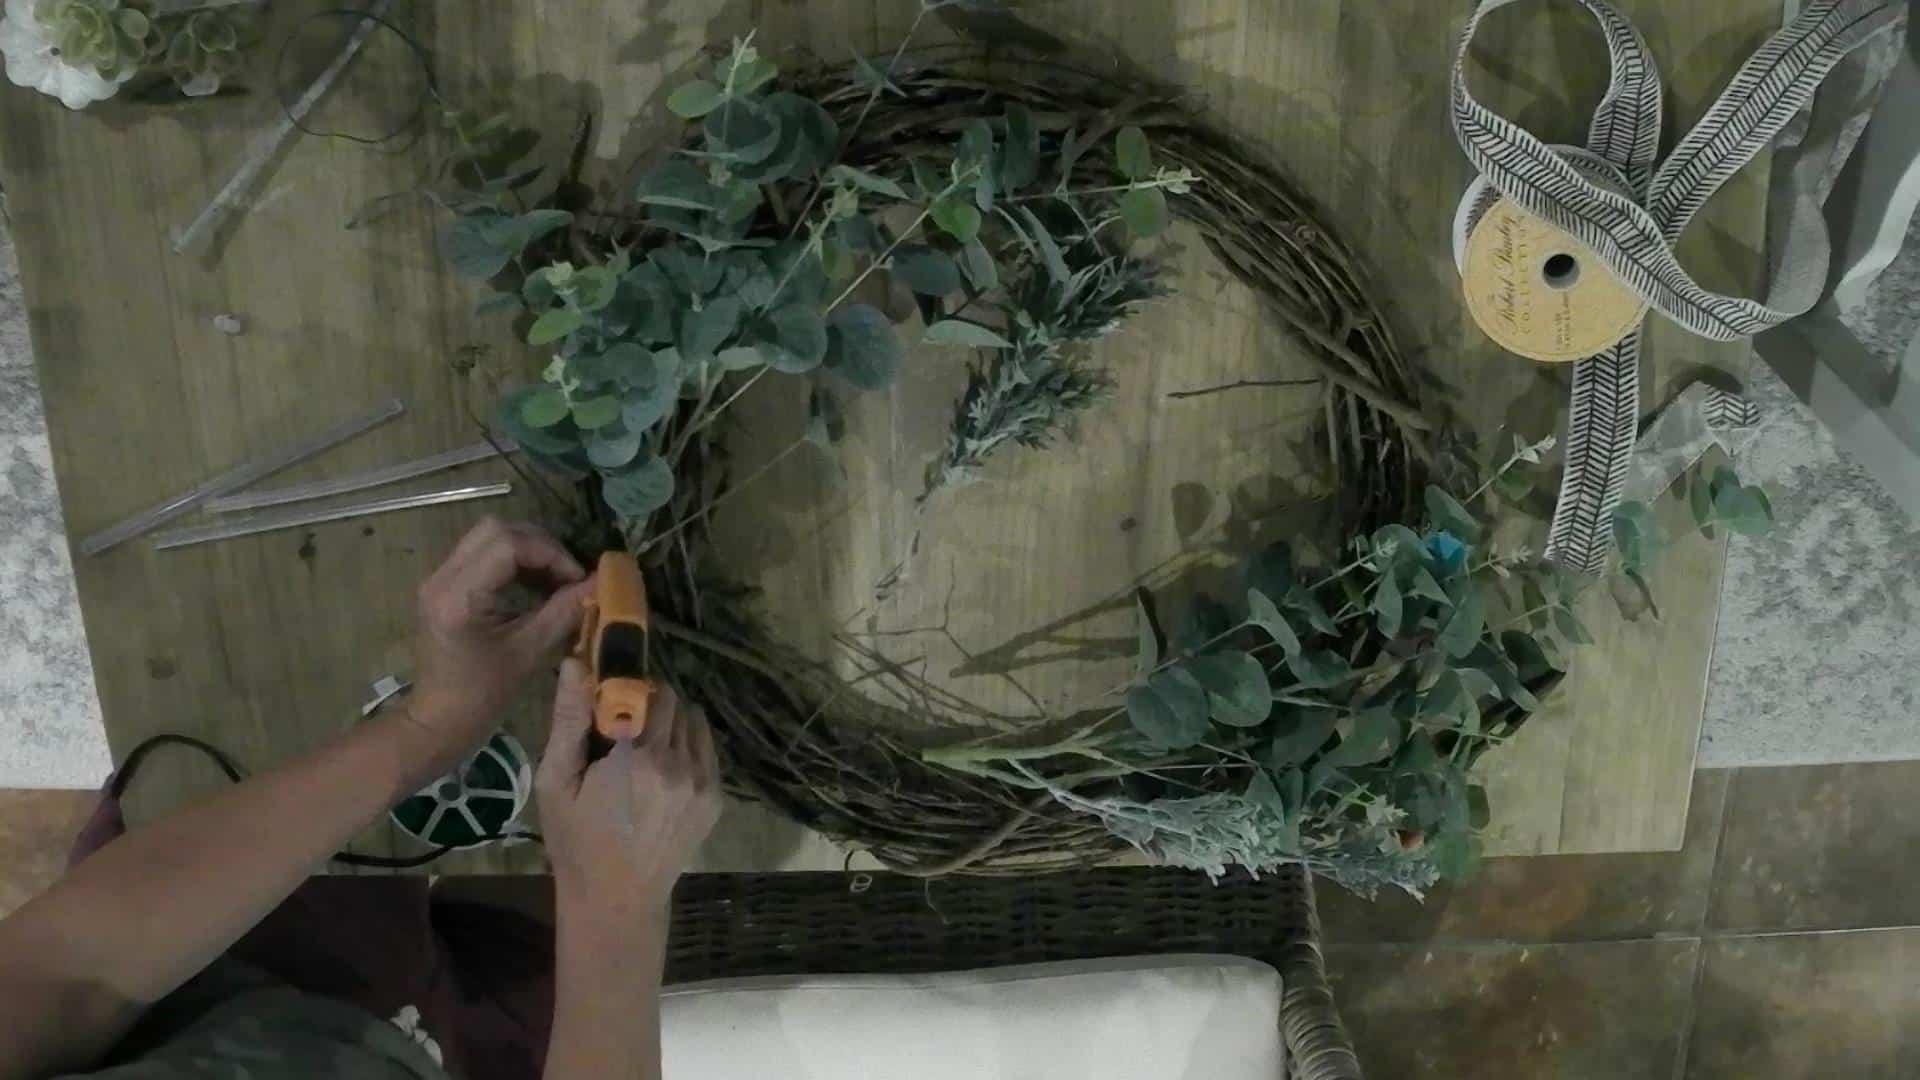 DIY Fall Wreath With Pumpkins